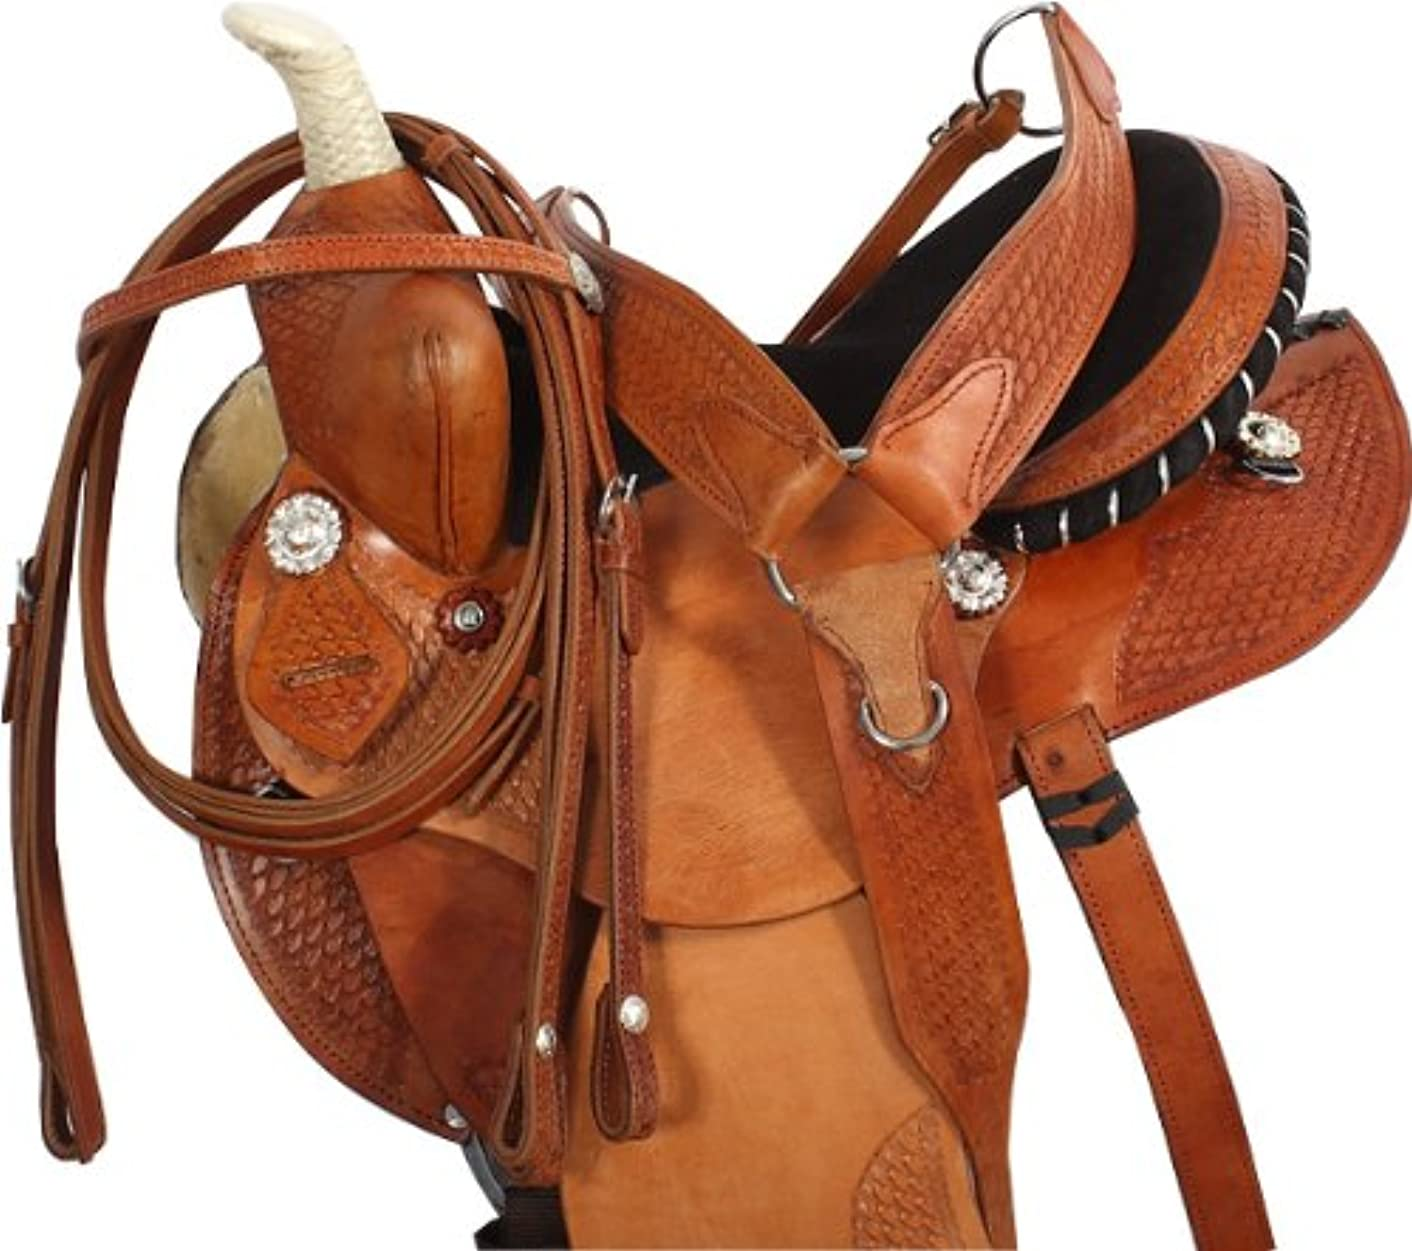 NEW ARABIAN WESTERN PLEASURE BARREL RACING LEATHER HORSE SADDLE & TACK PACKAGE 14 15 16